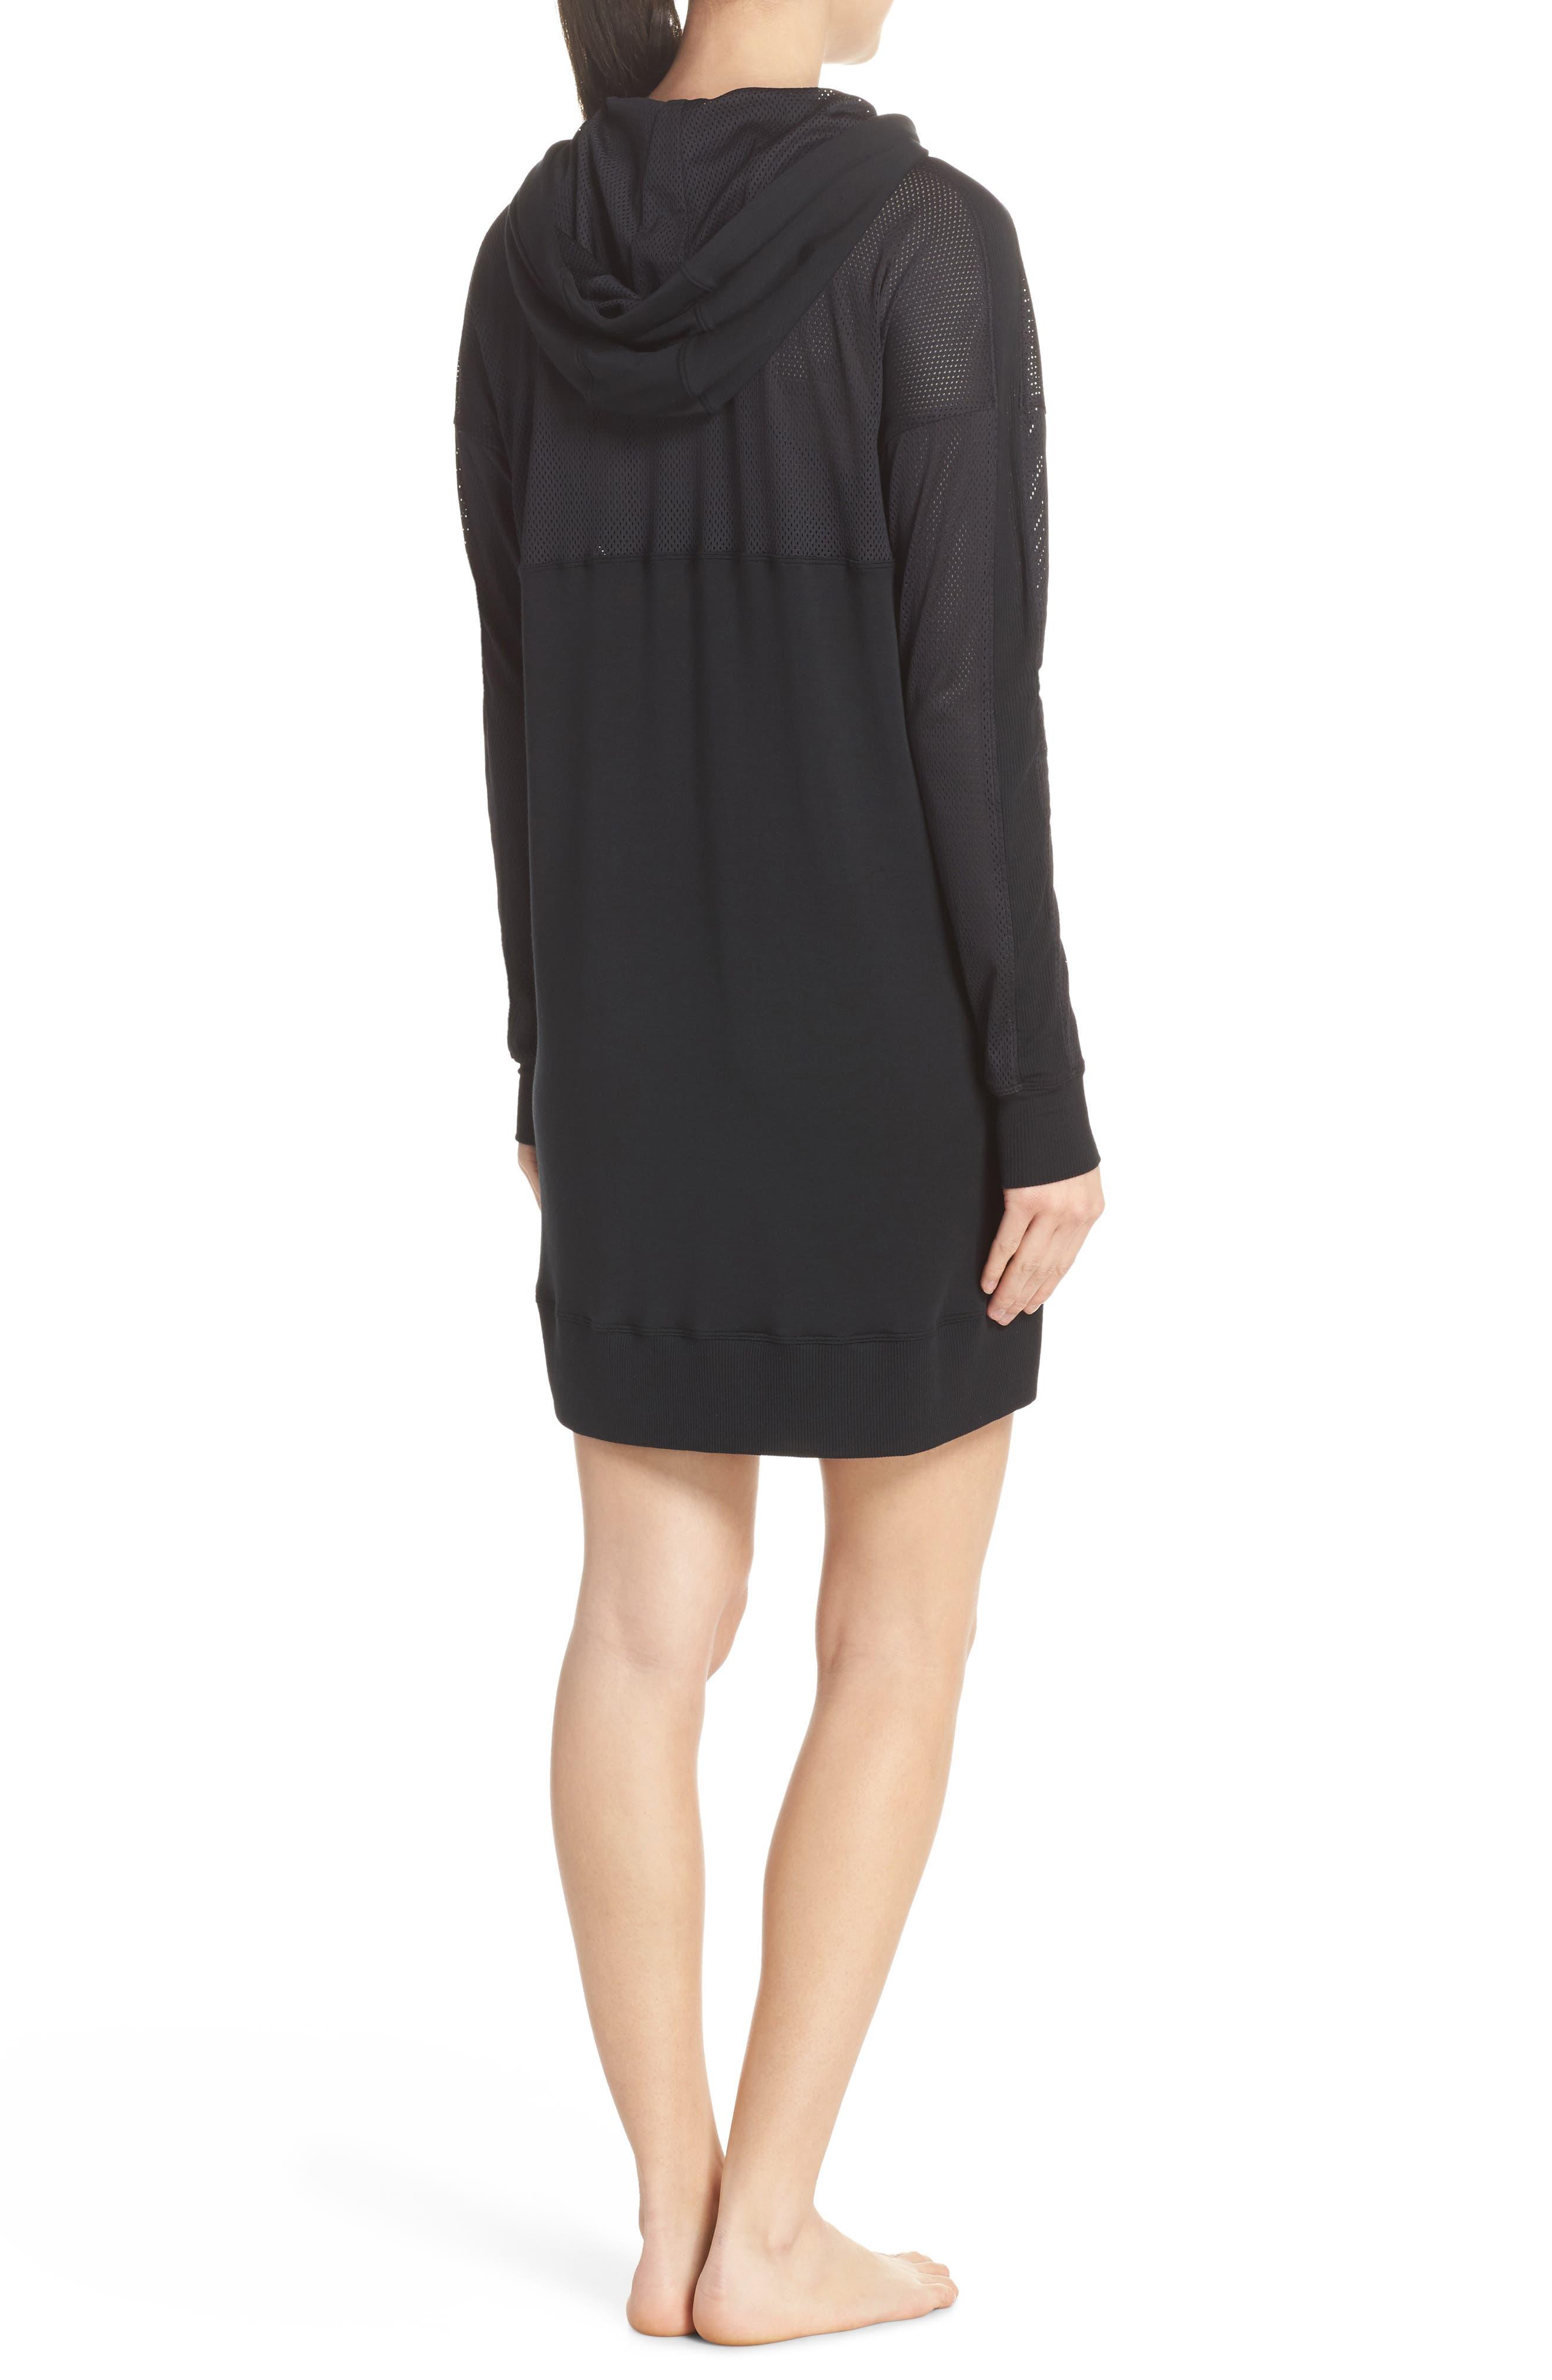 Range Dress,                             Alternate thumbnail 2, color,                             Black